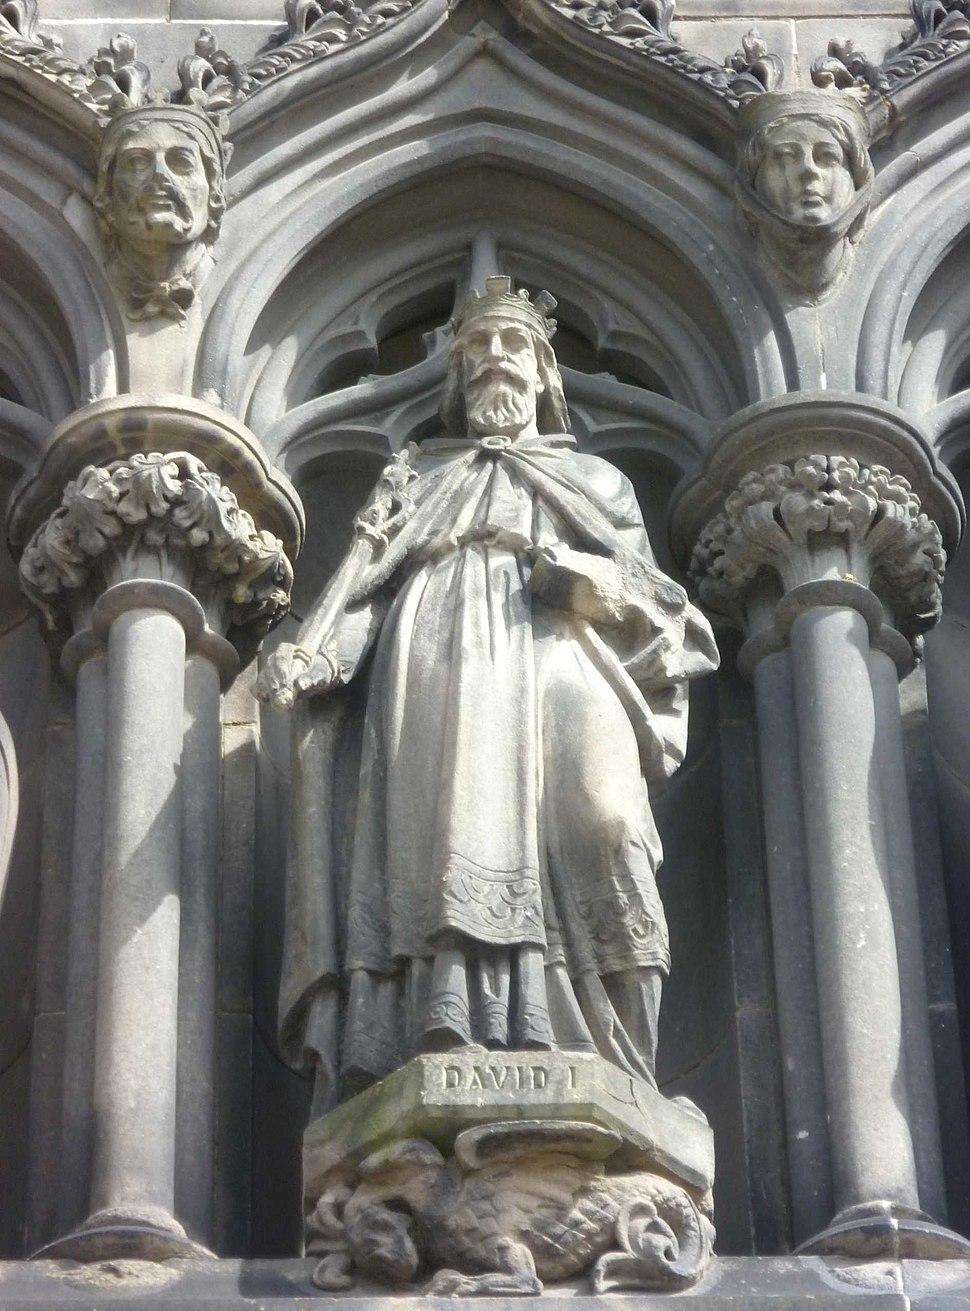 Statue of David I on the West Door of St. Giles High Kirk, Edinburgh